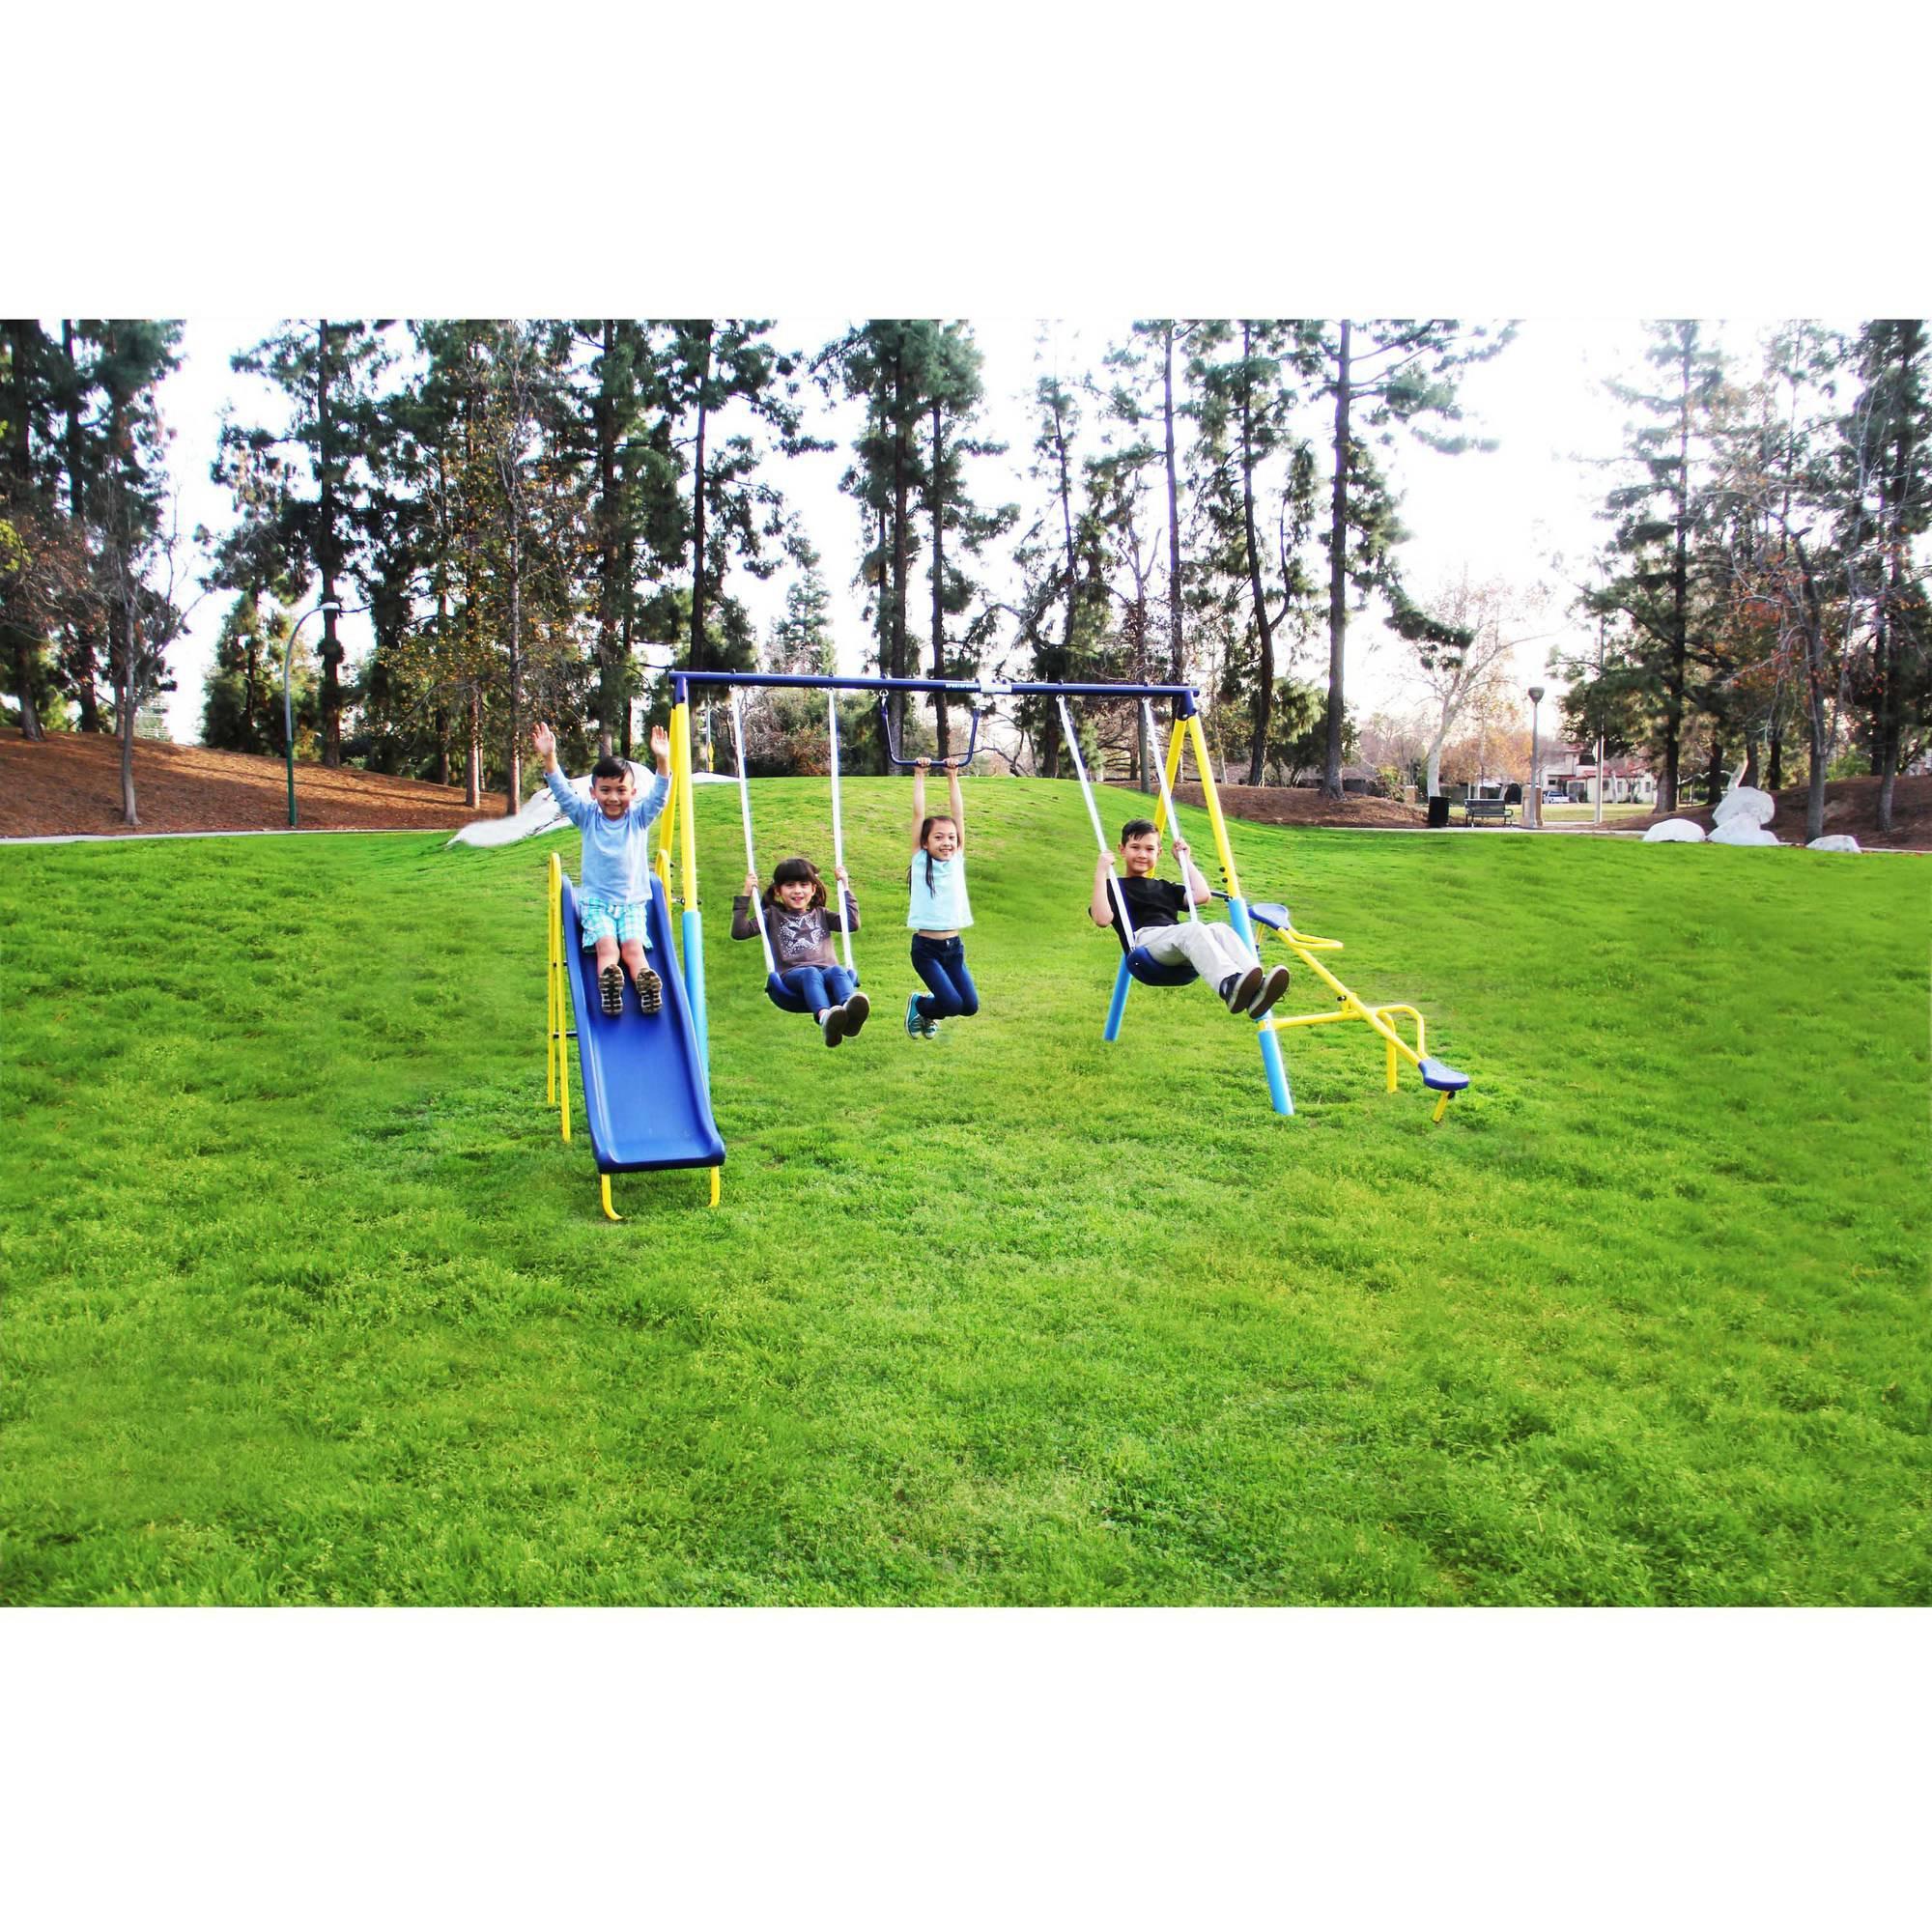 Sportspower Outdoor Super First Metal Swing Set